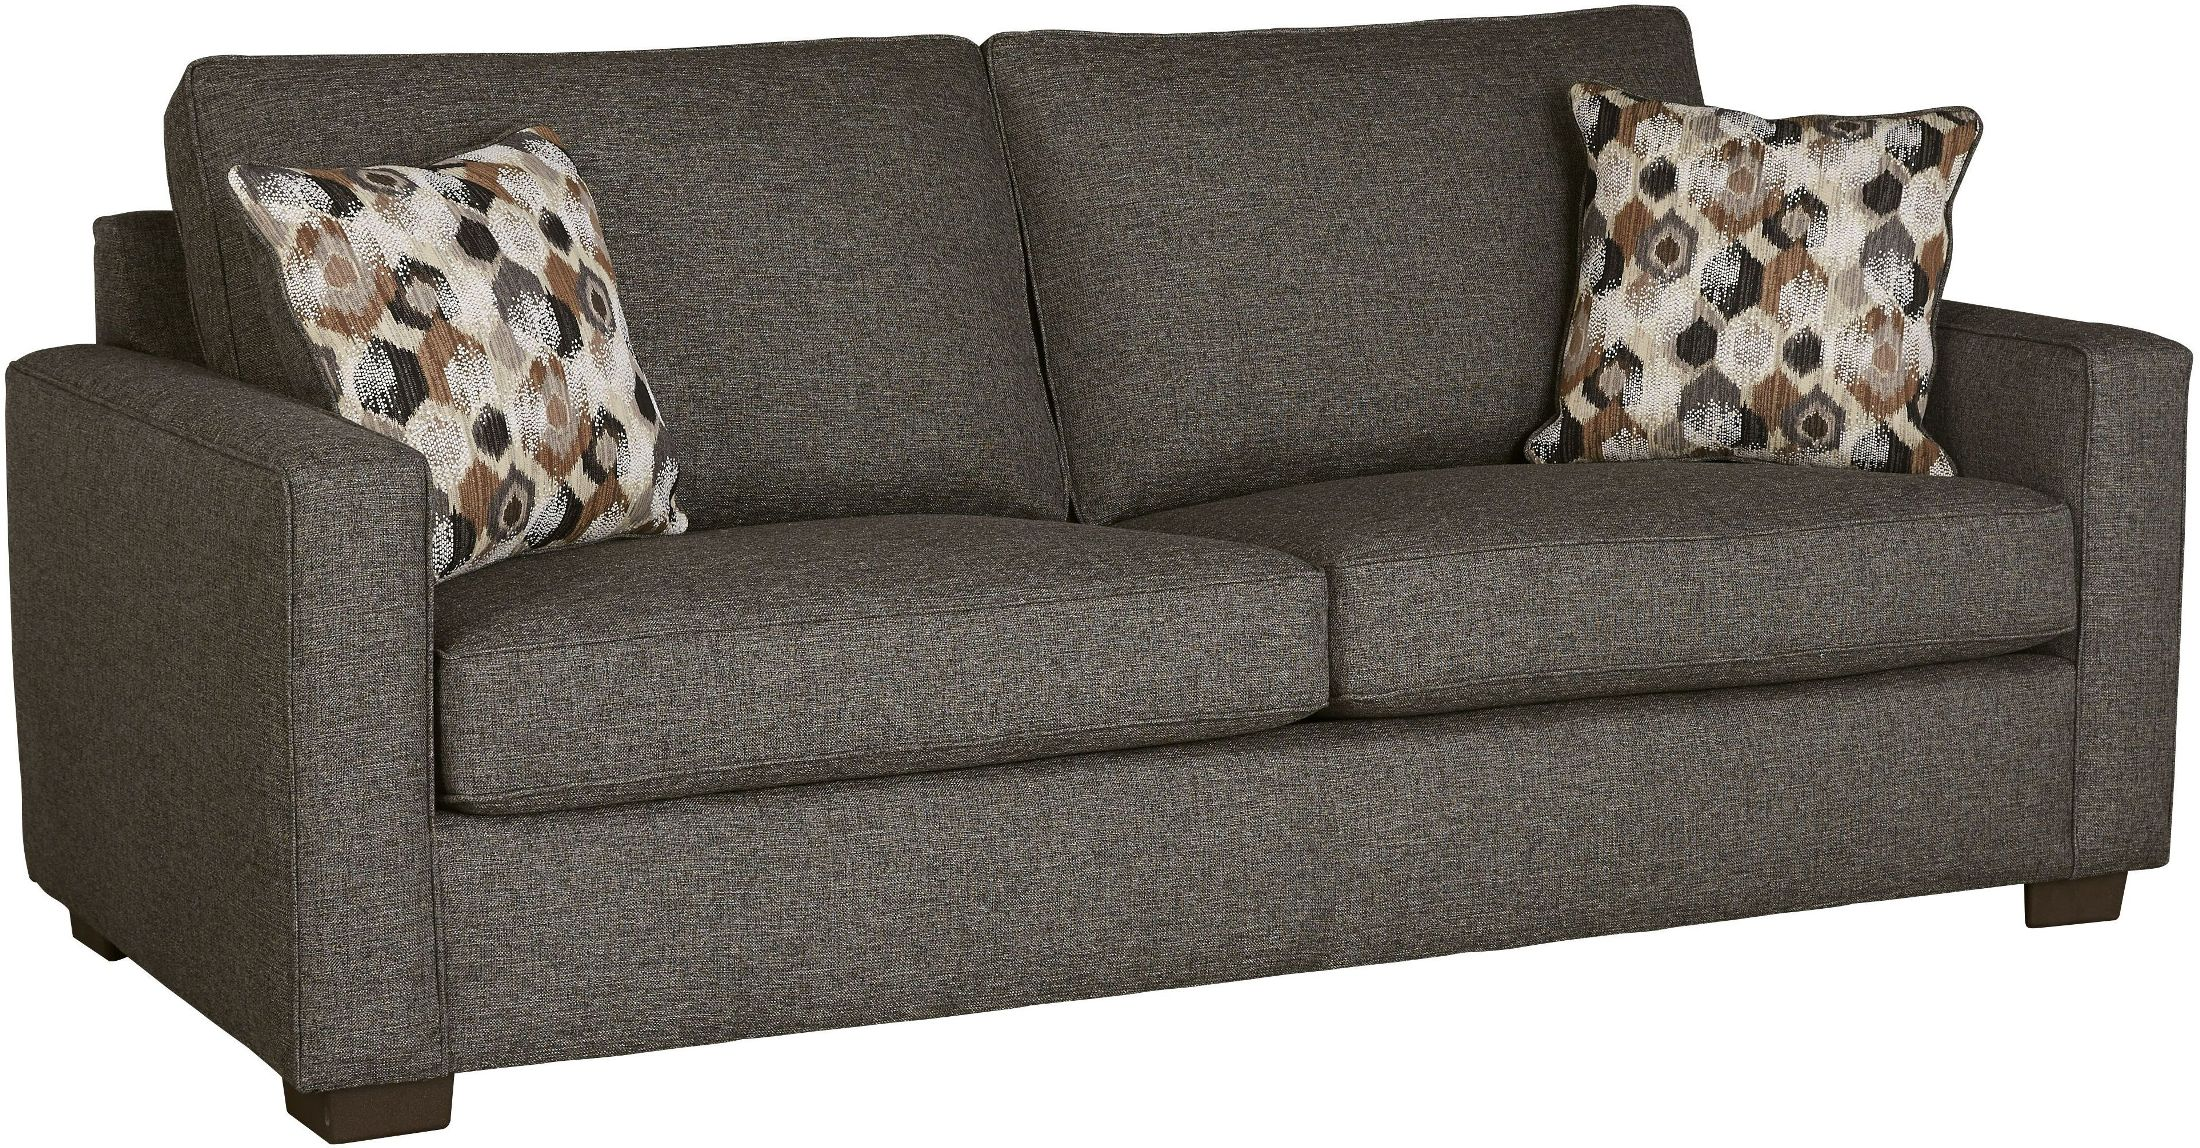 Colson Charcoal Sofa From Progressive Furniture Coleman Furniture